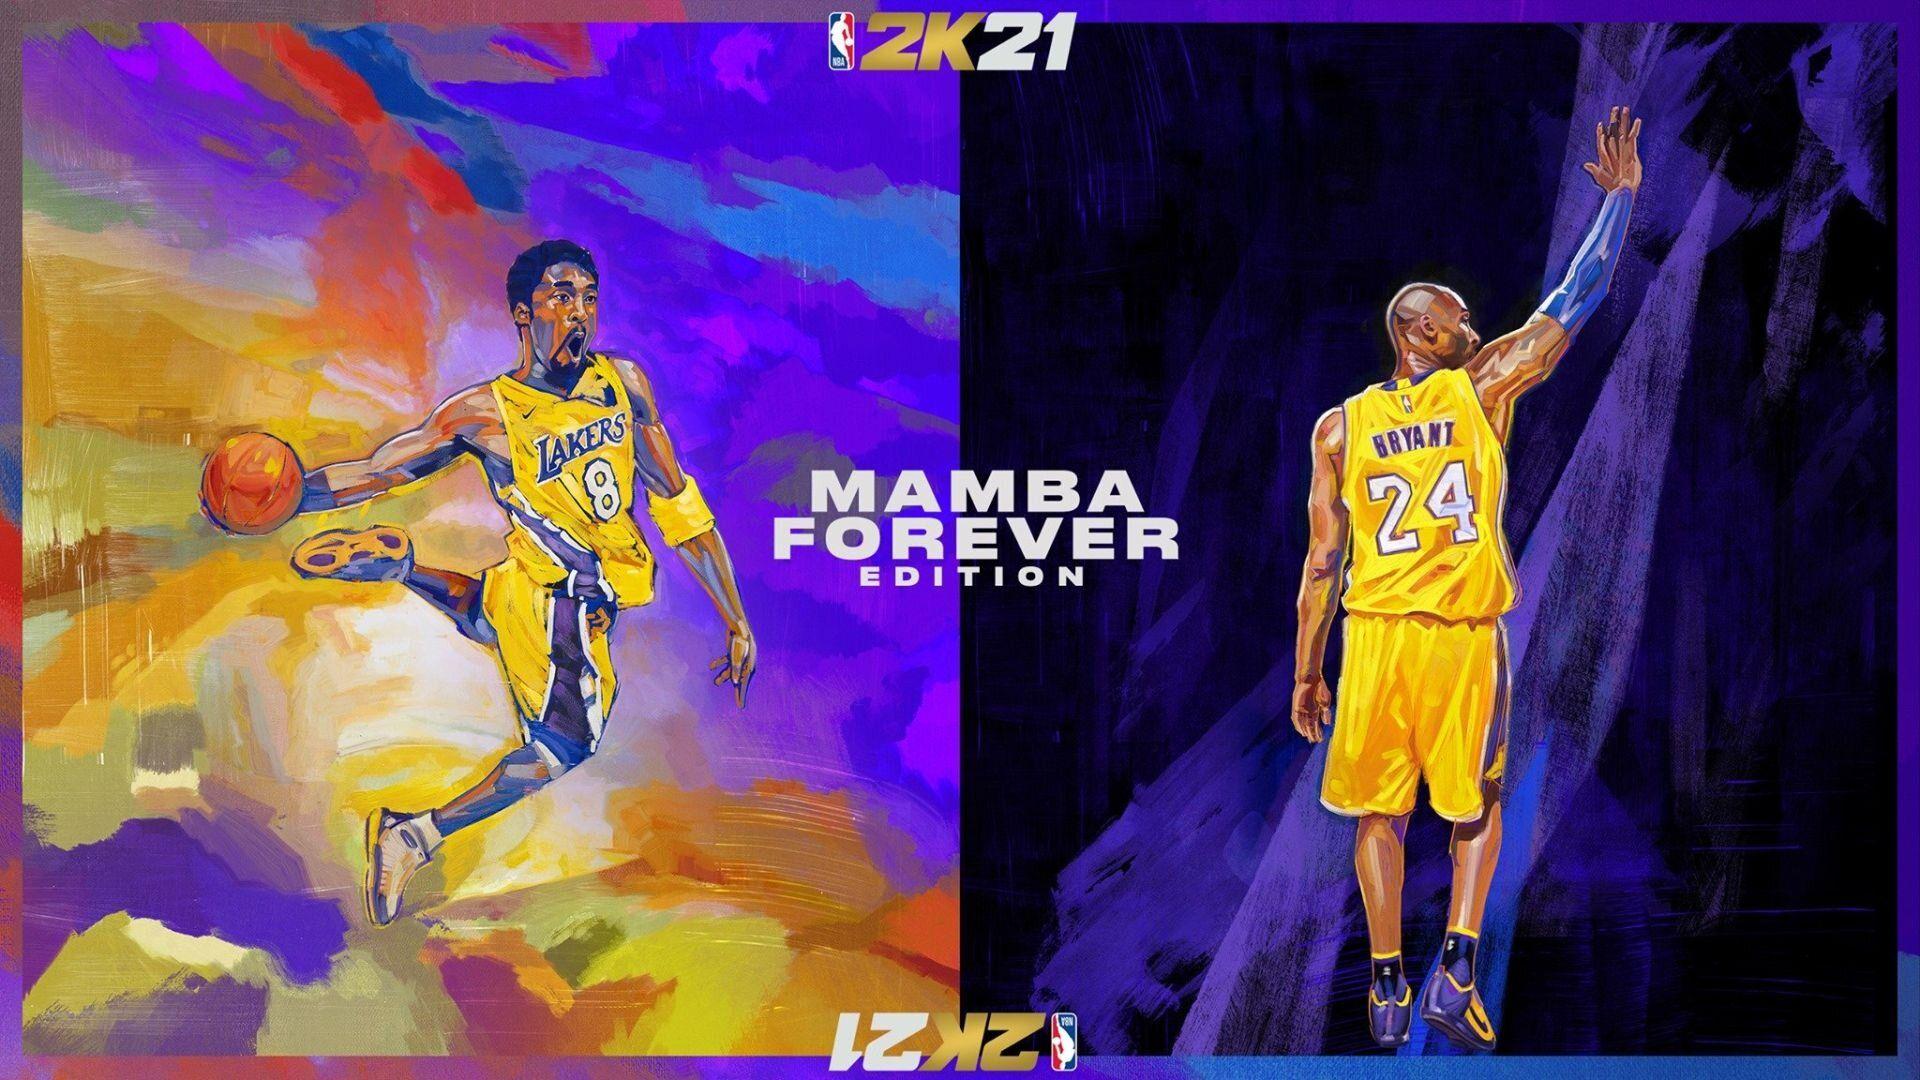 NBA 2k21 Desktop Wallpapers - Wallpaper Cave